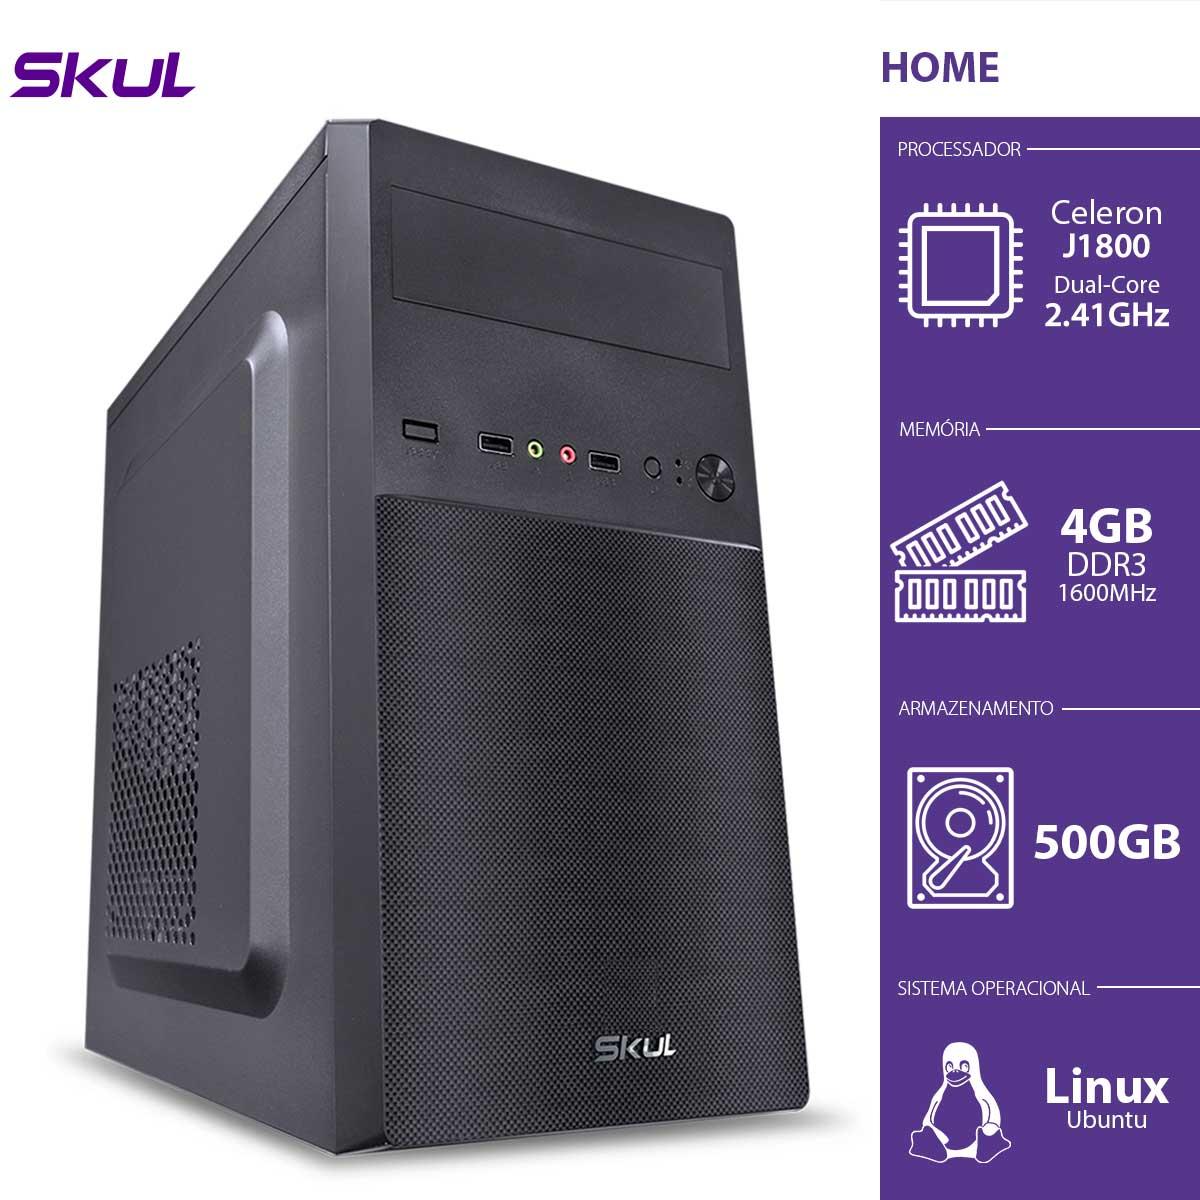 Computador Home H100 - Celeron Dual Core J1800 2.41GHZ 4GB DDR3 Sodimm HD 500GB HDMI/VGA Fonte 200W